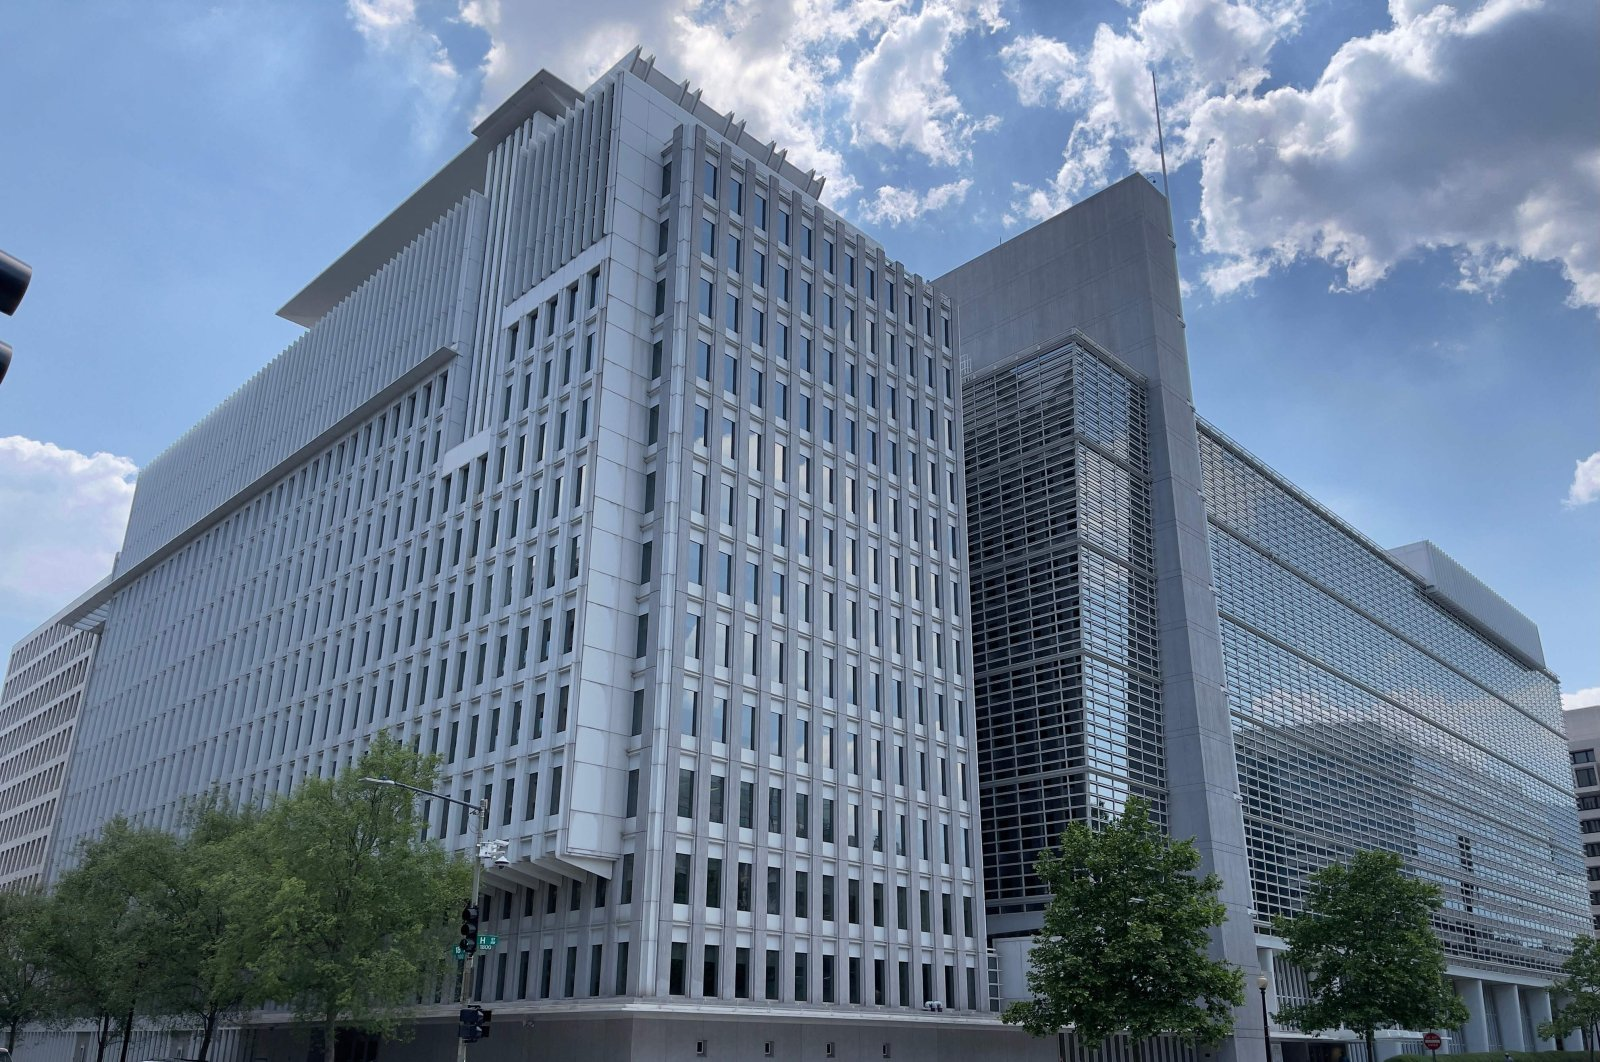 World Bank headquarters seen in Washington, D.C., U.S., on May 20, 2021. (AFP Photo)